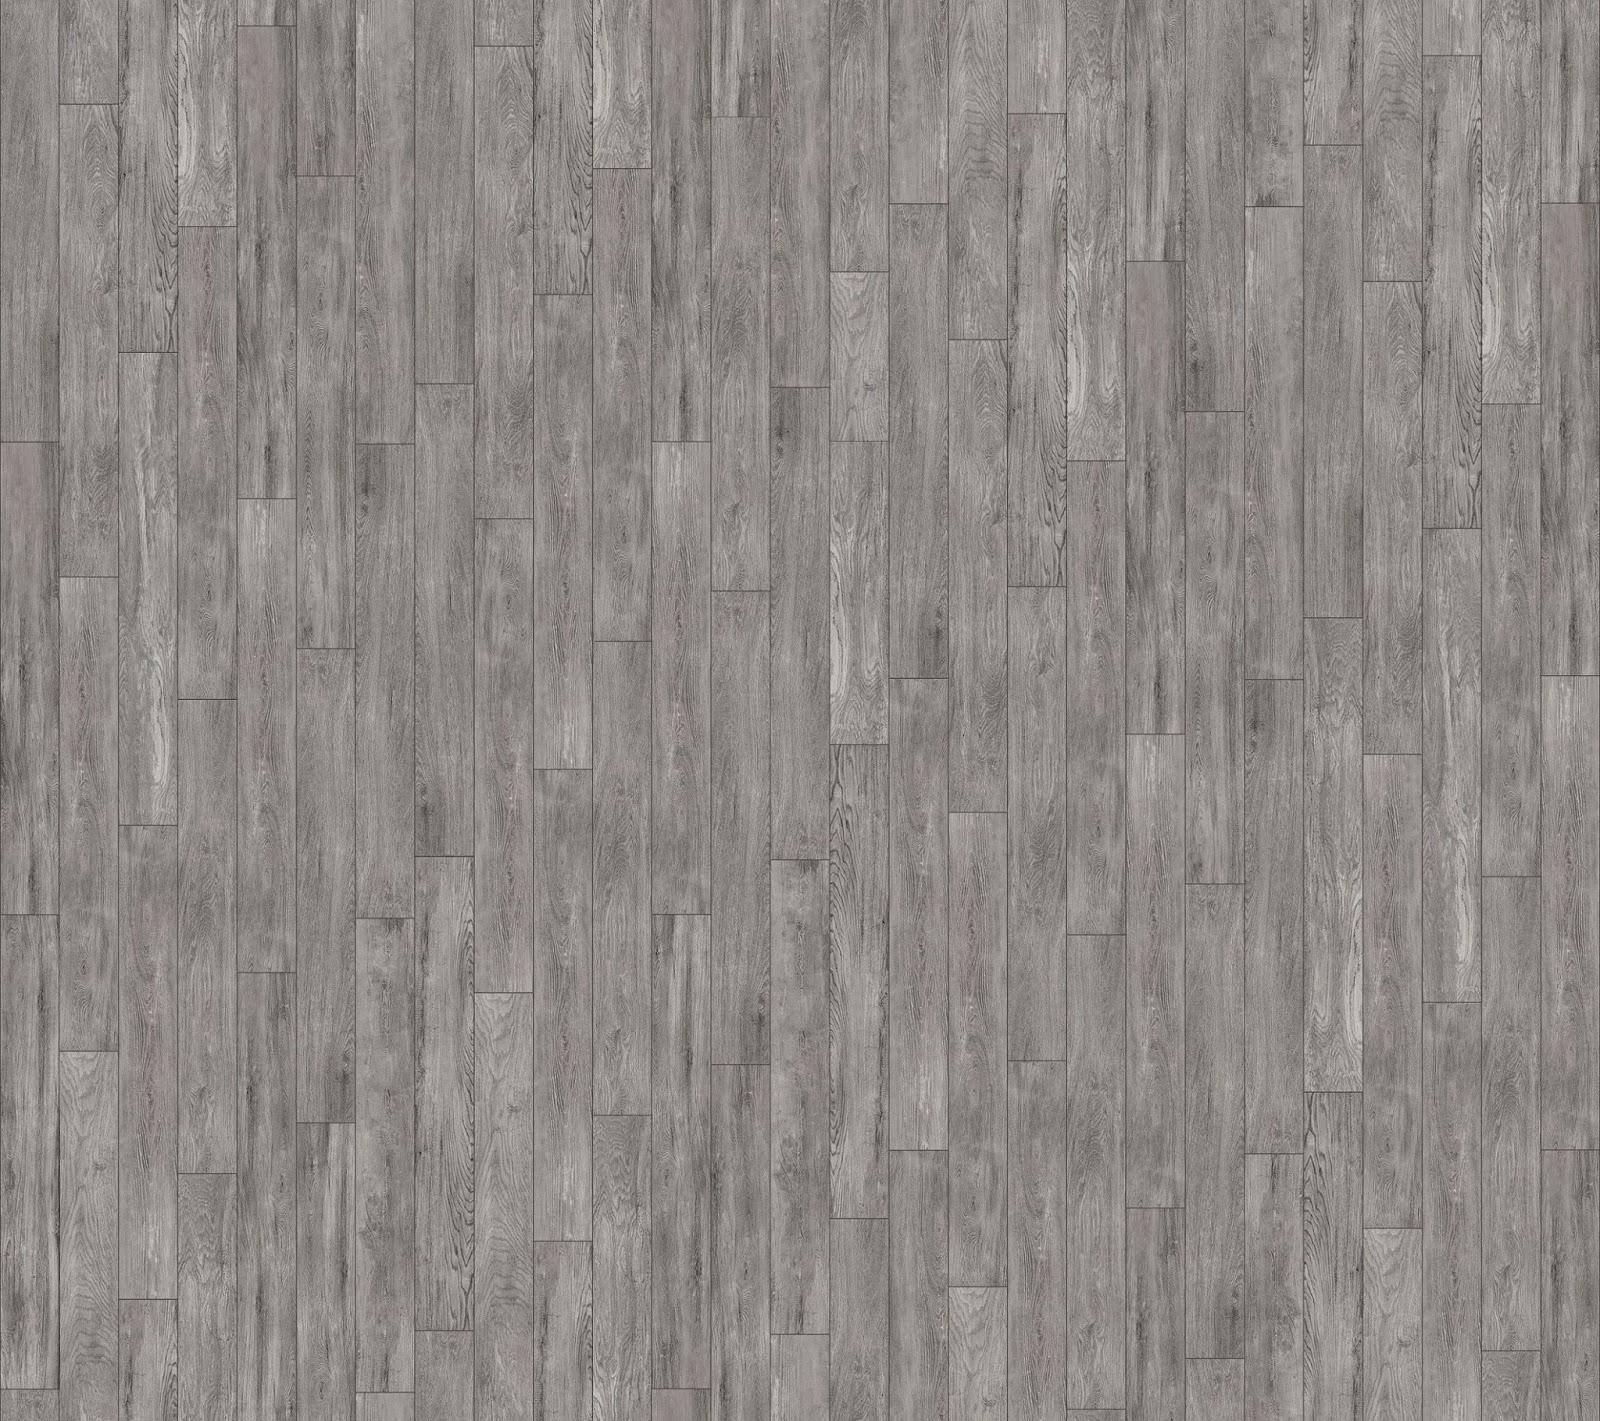 Texture Seamless